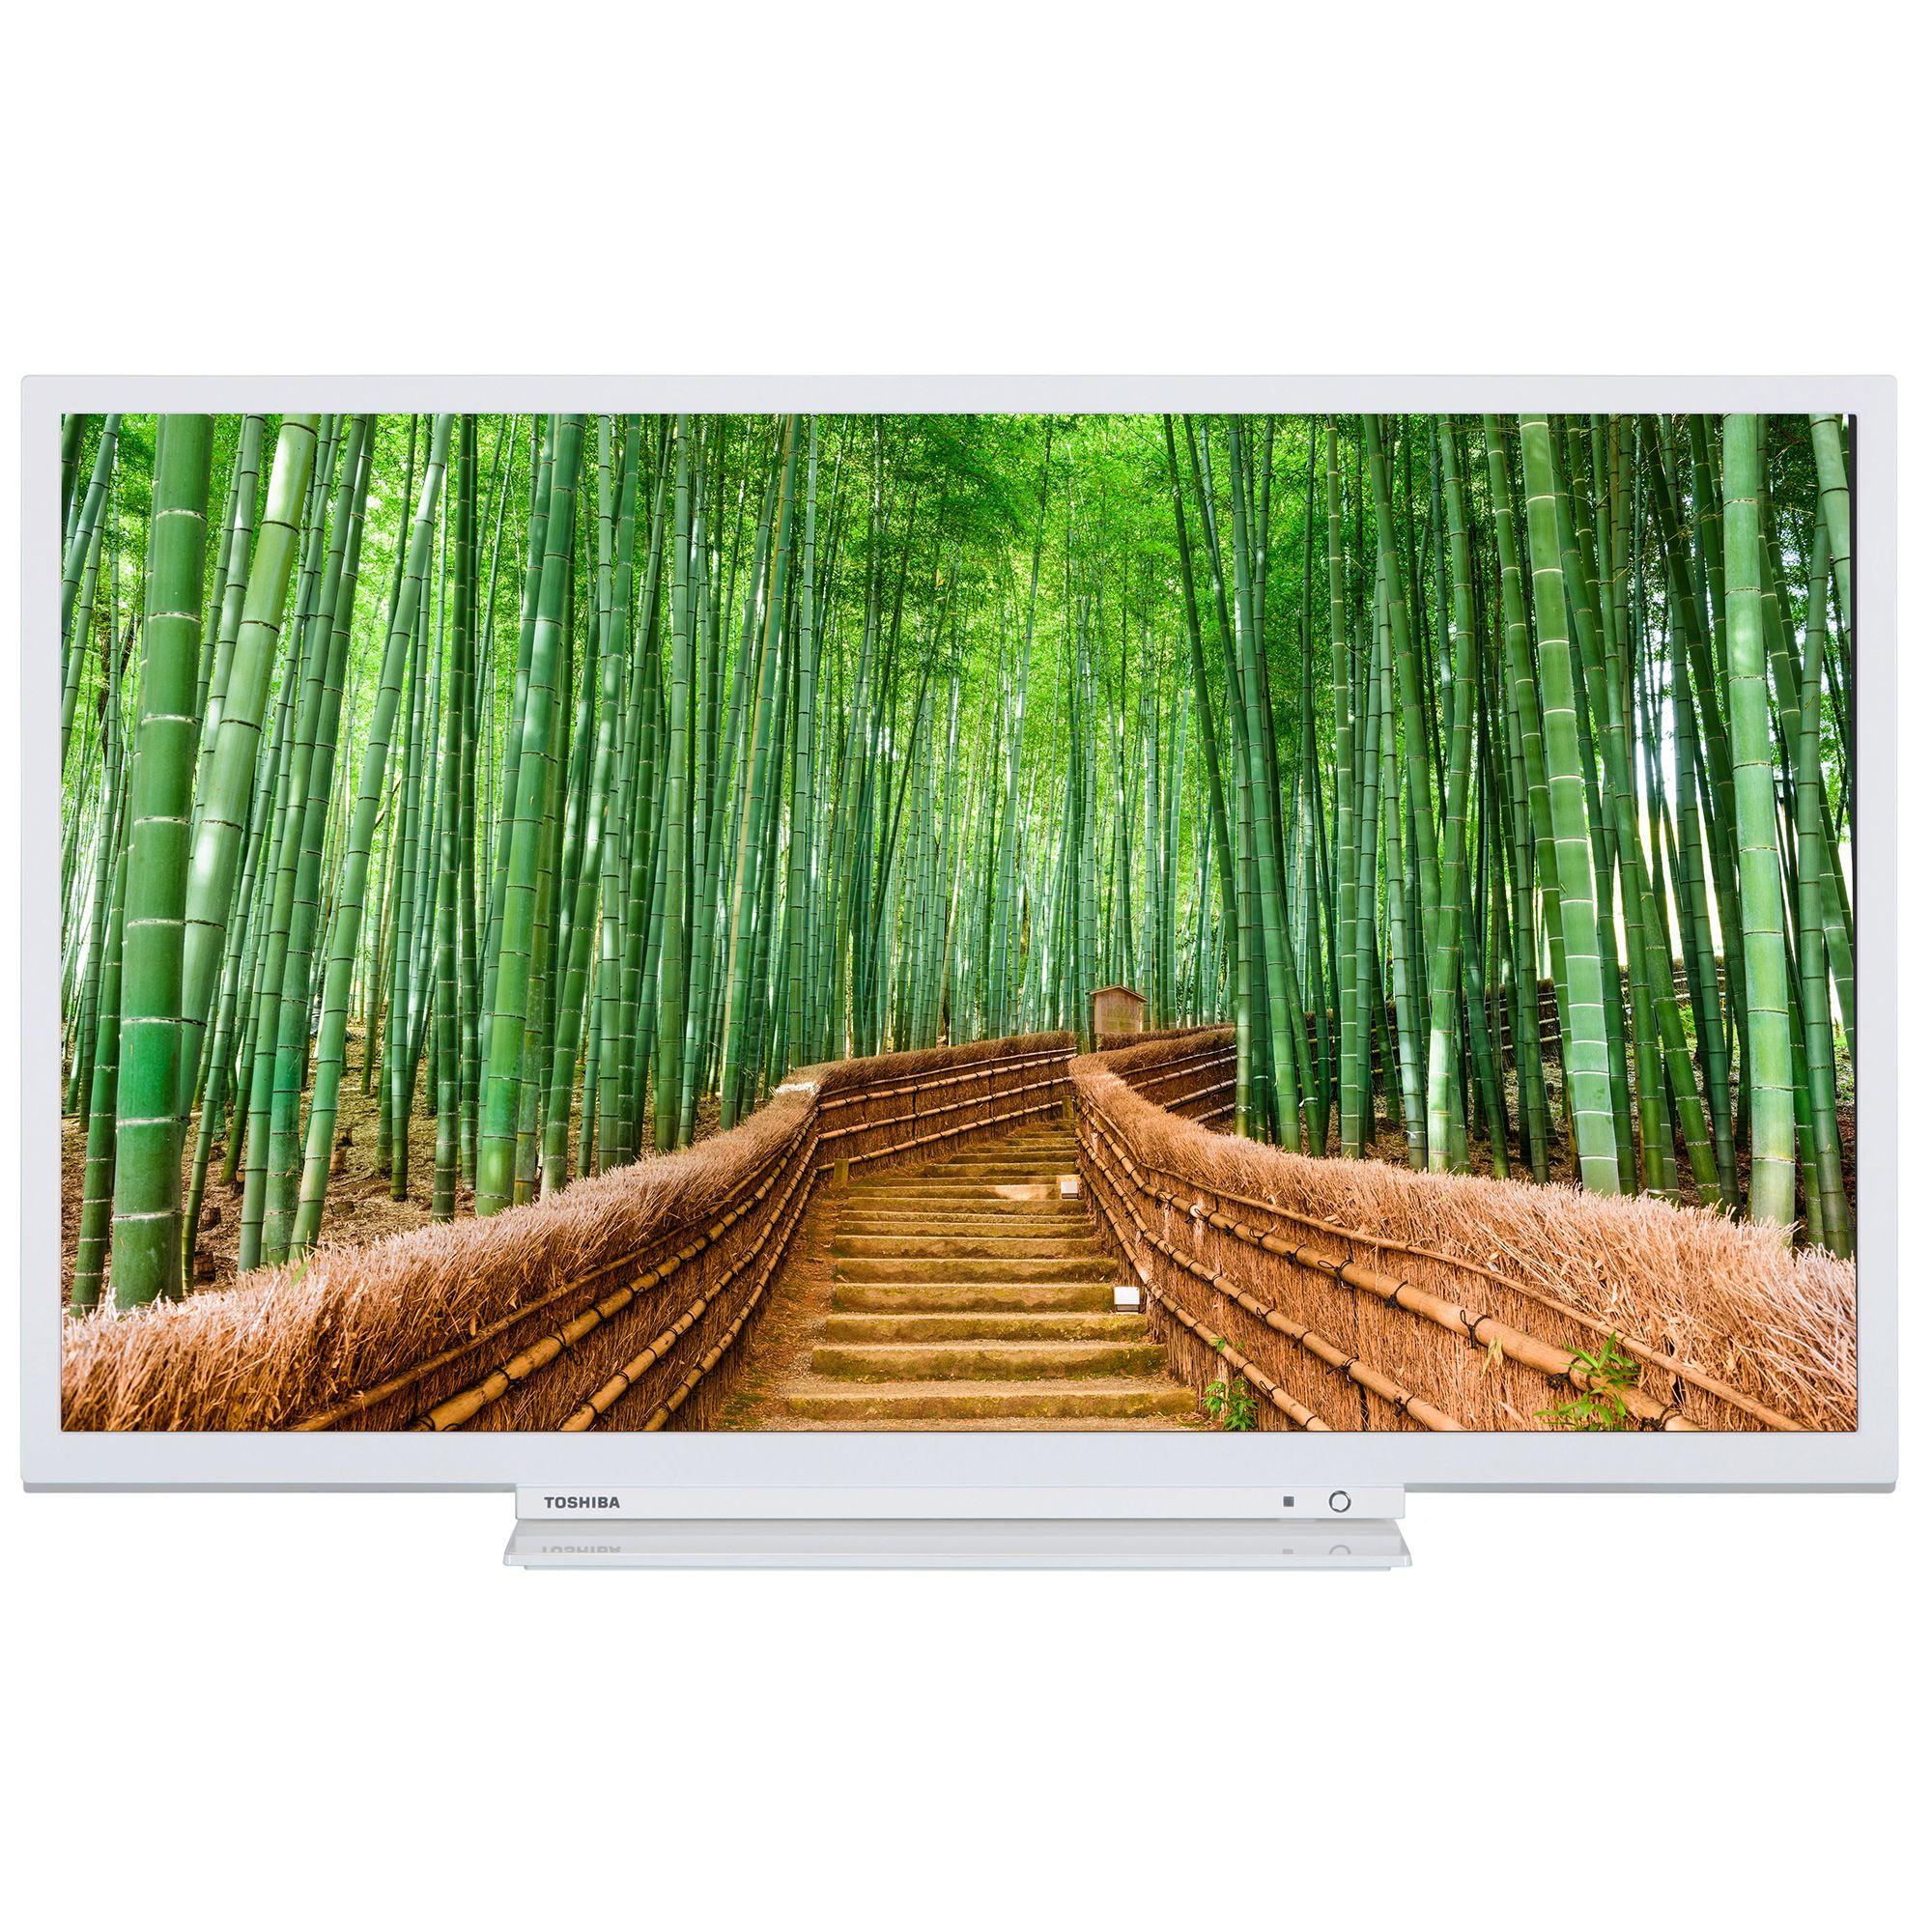 Televizor LED Toshiba 32W1764DG 81cm HD Ready Alb